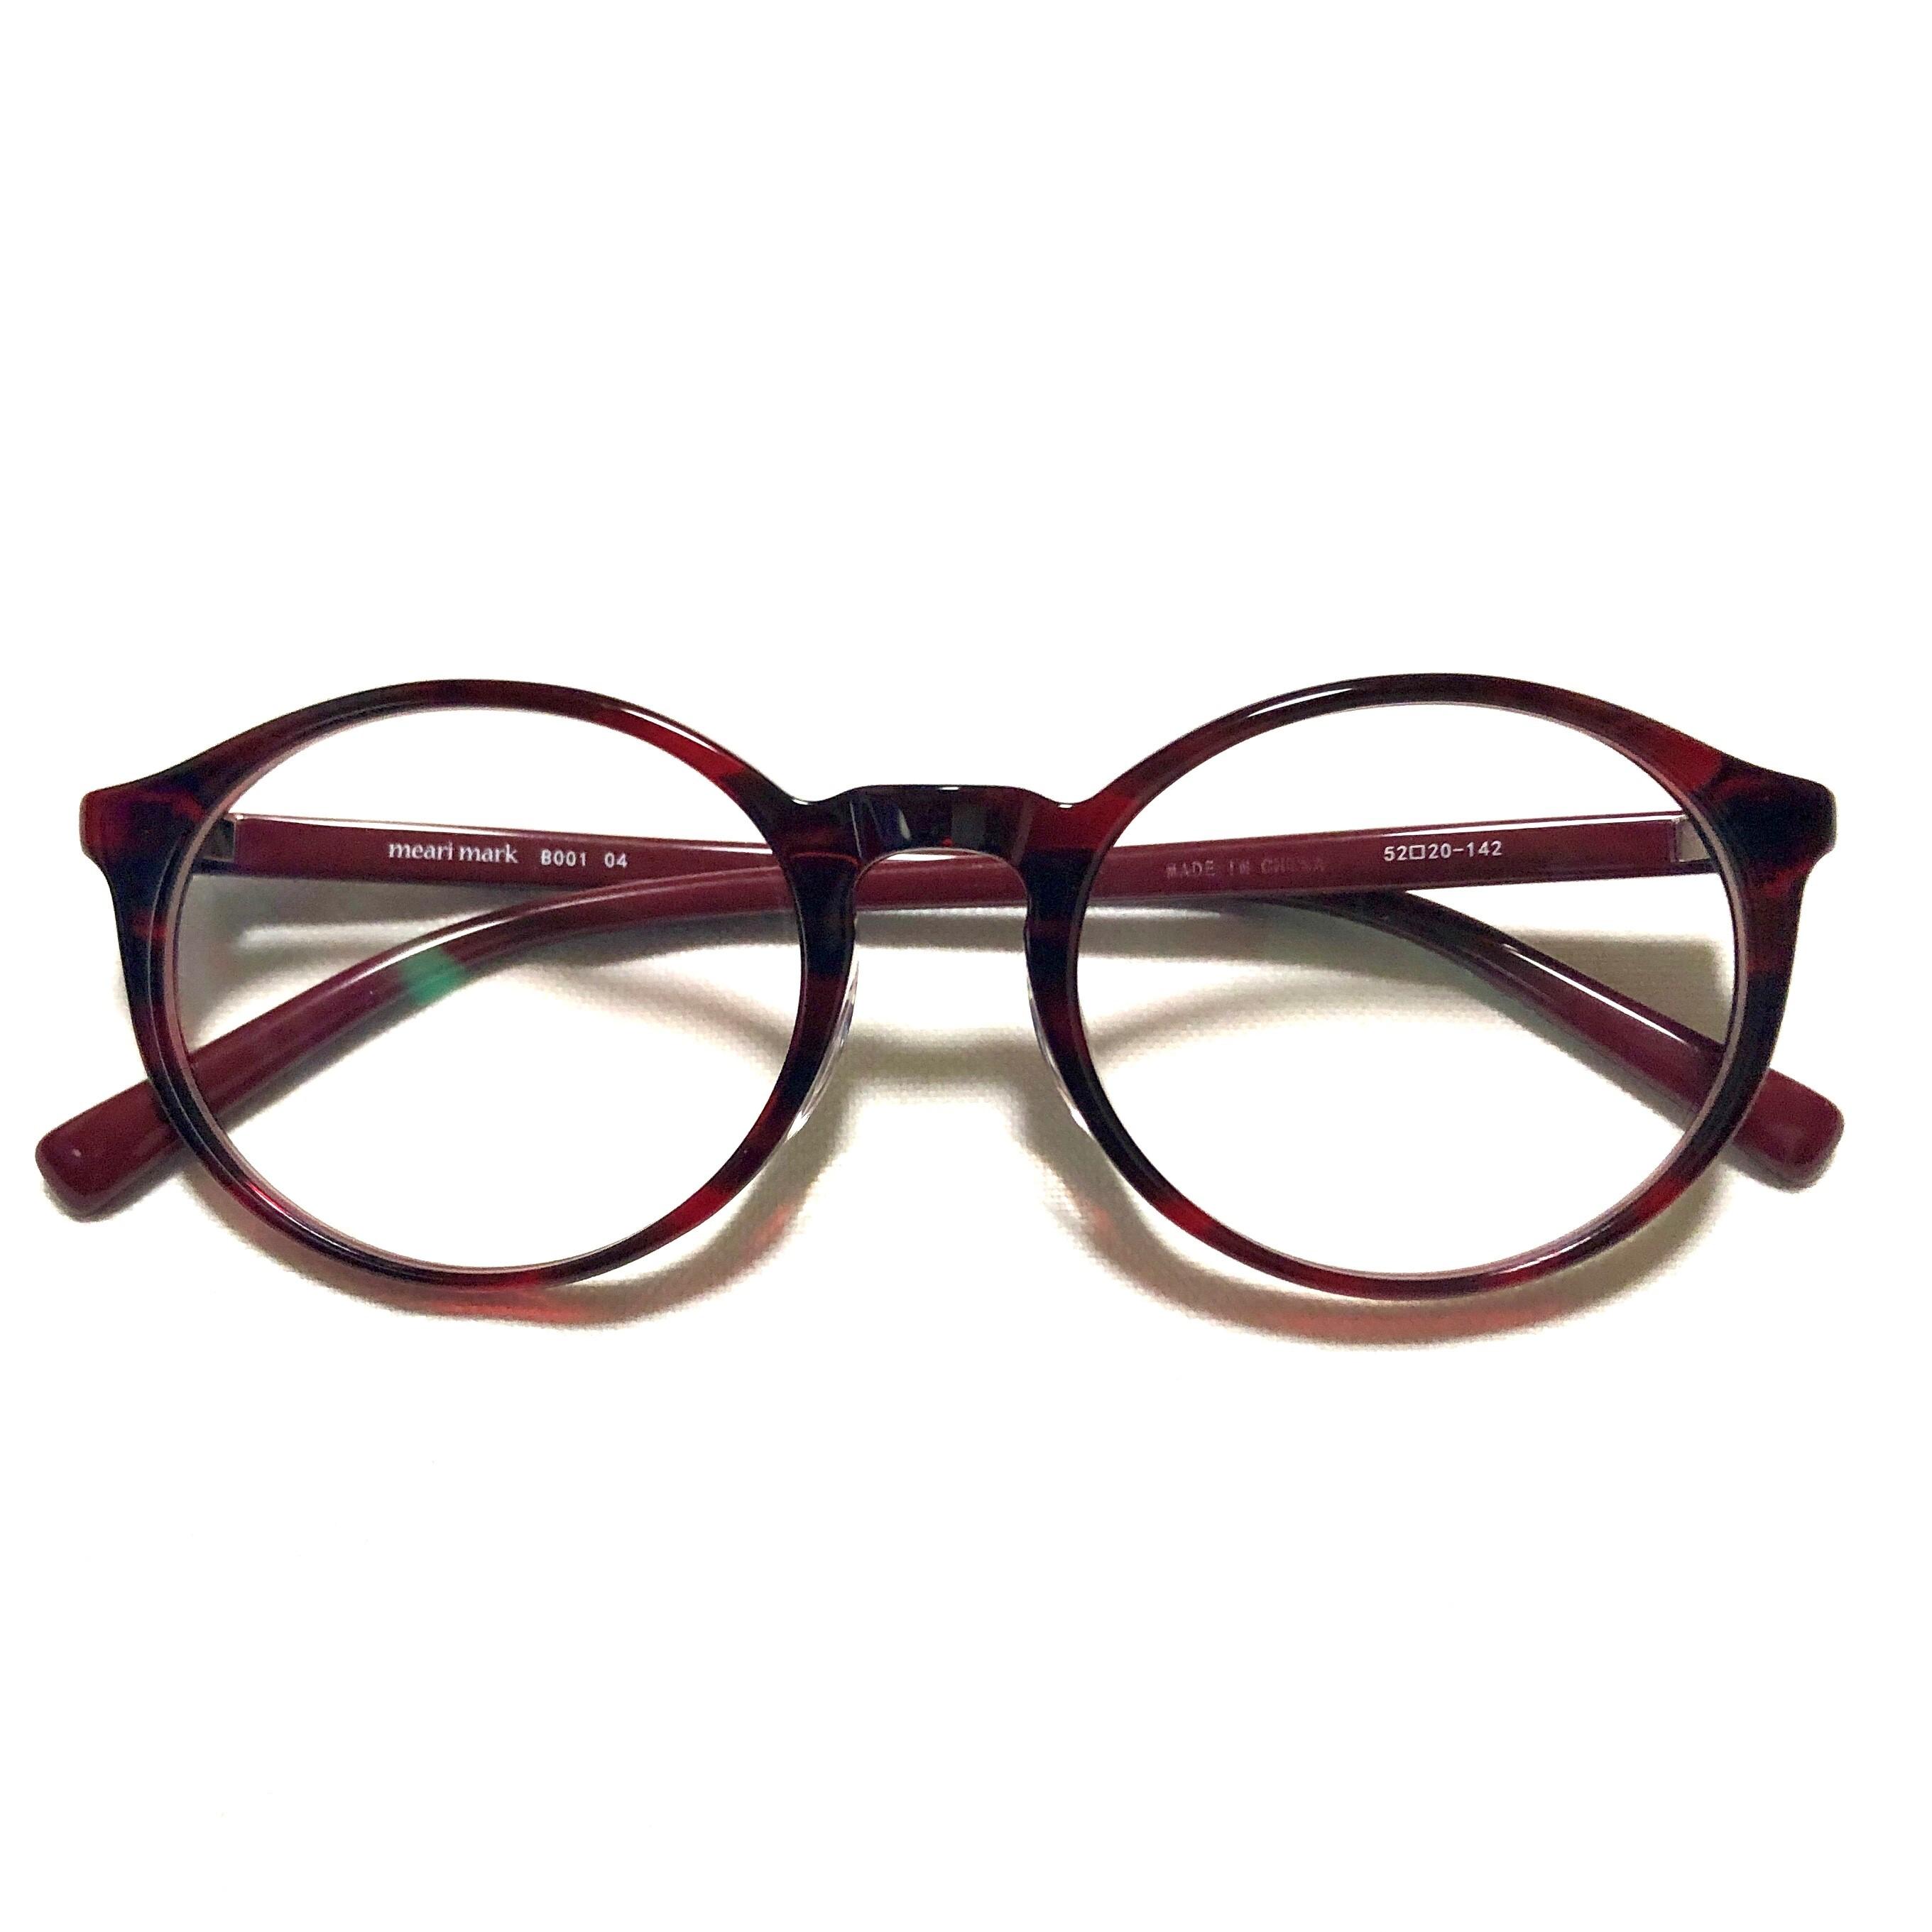 meari mark B001 04 (紫外線カットレンズ付きファッショングラス)